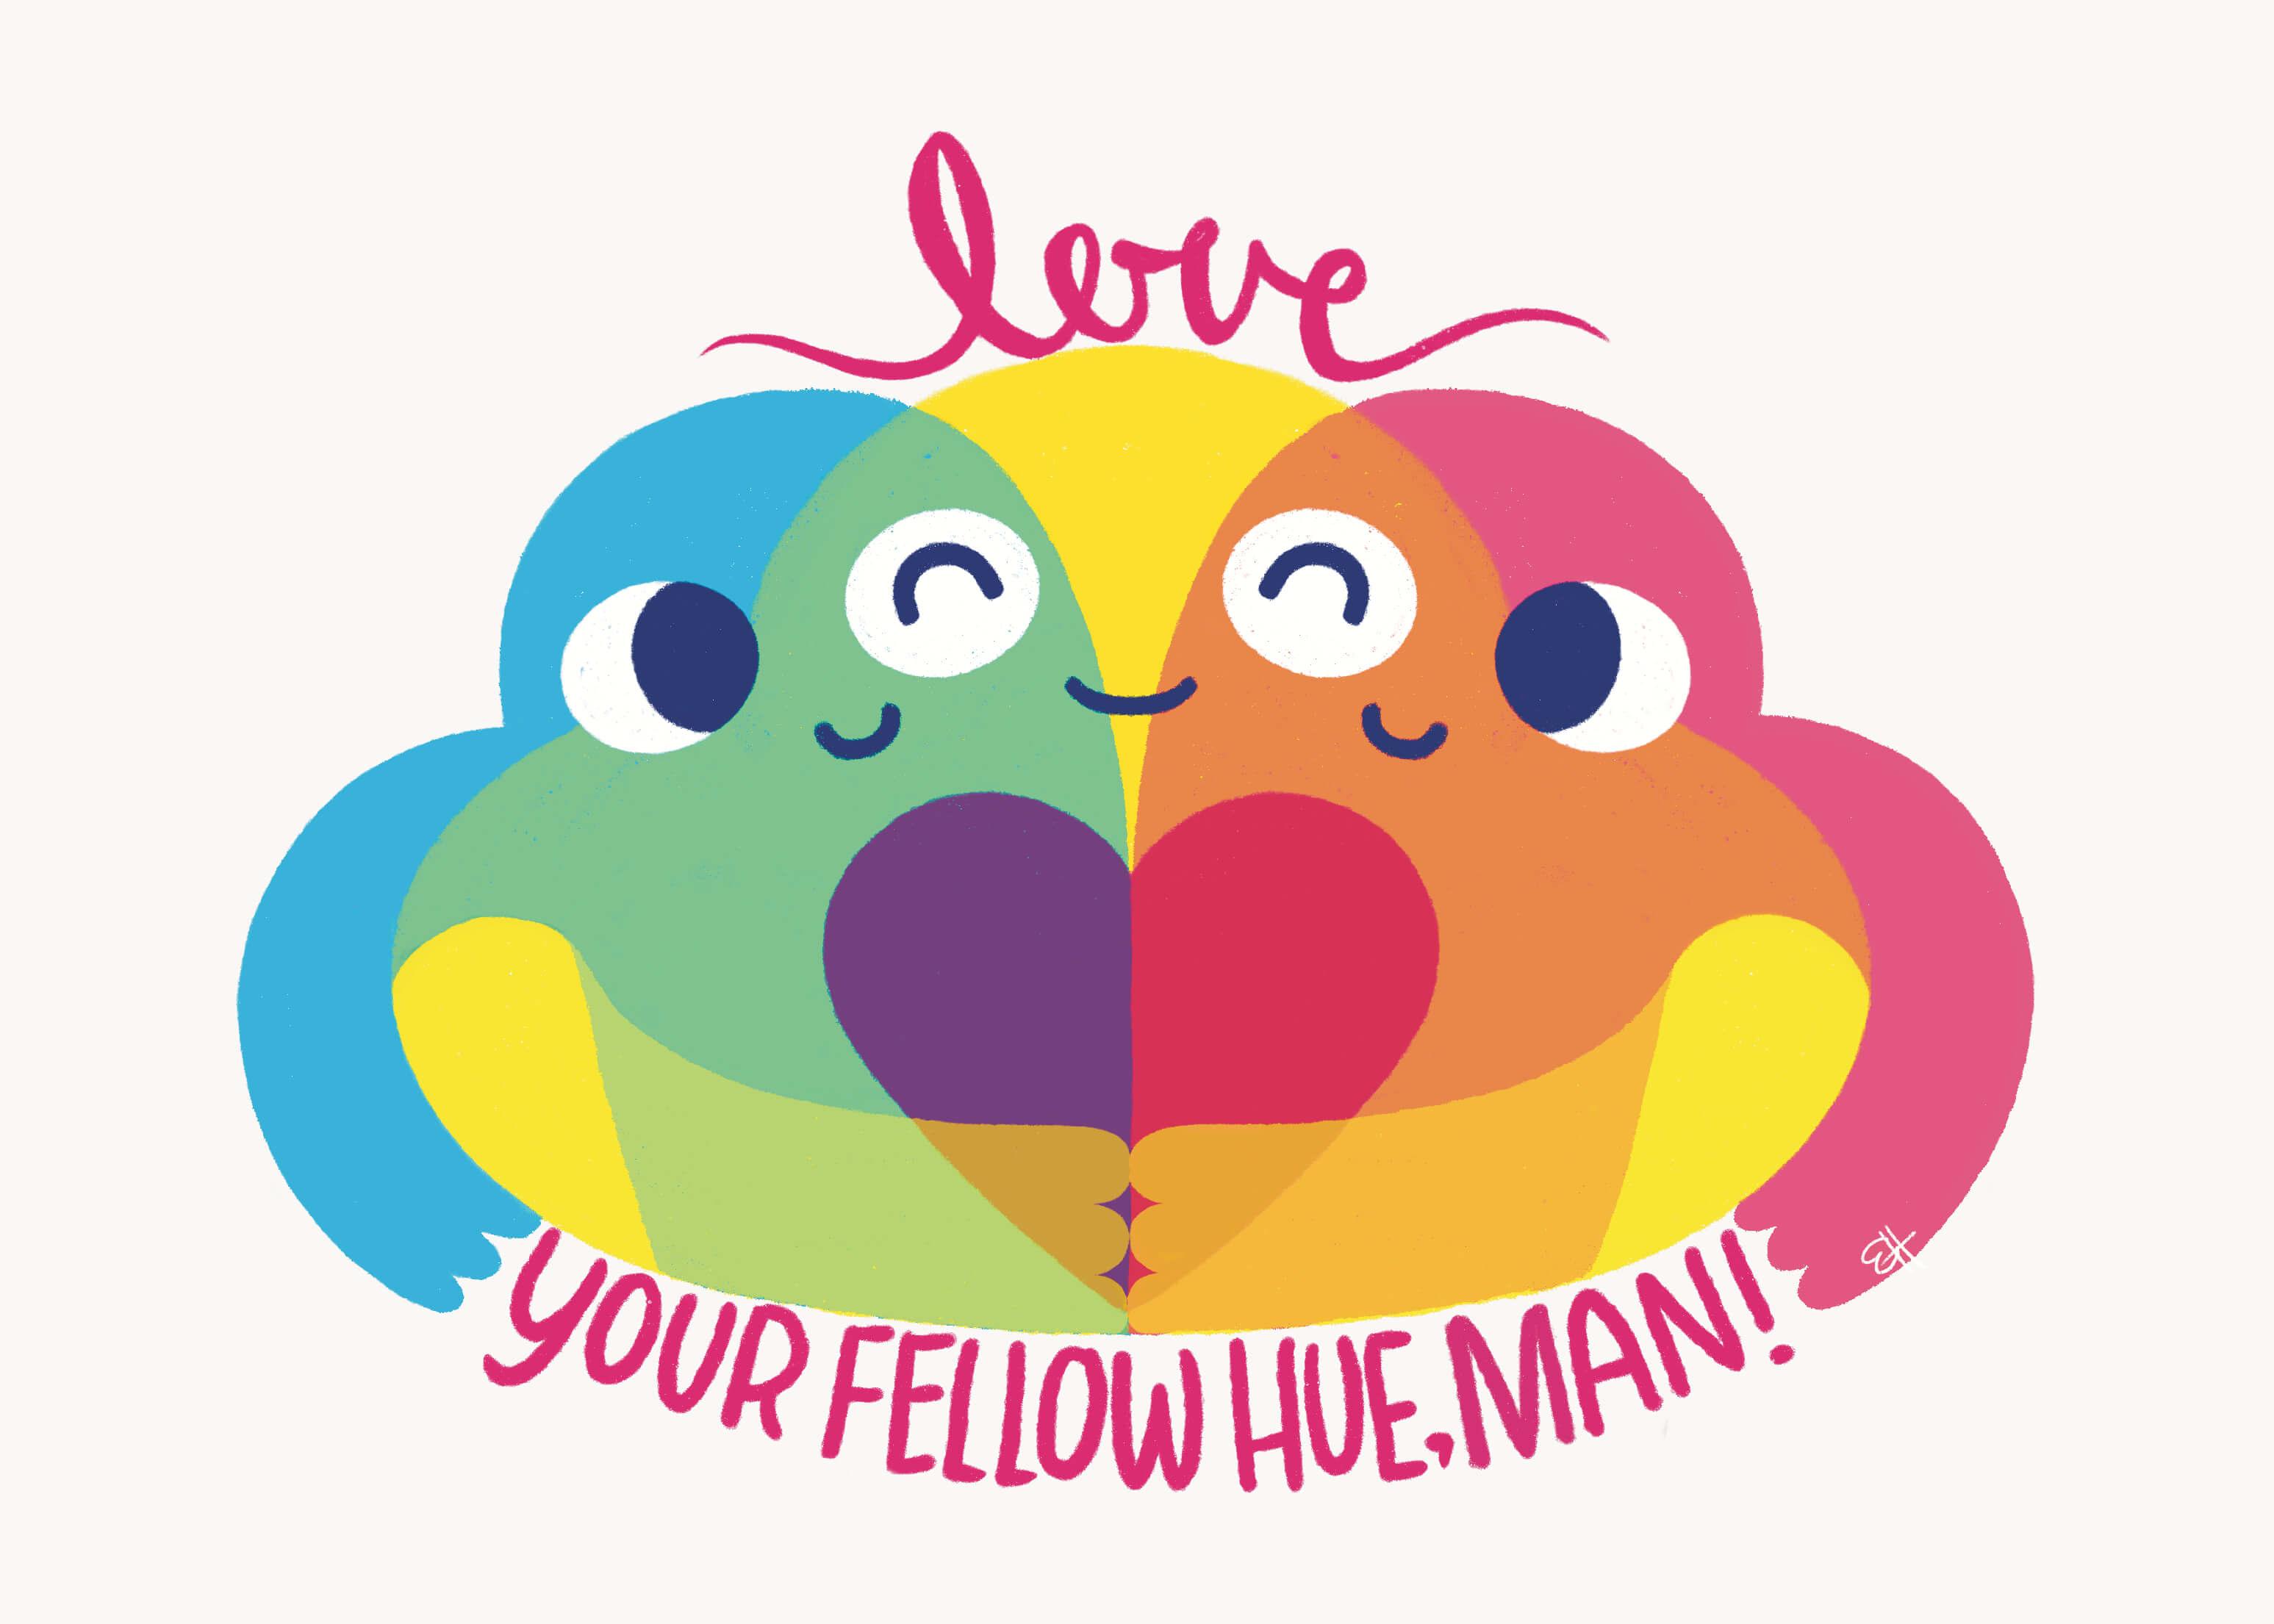 Love Your Fellow Hue, Man main image